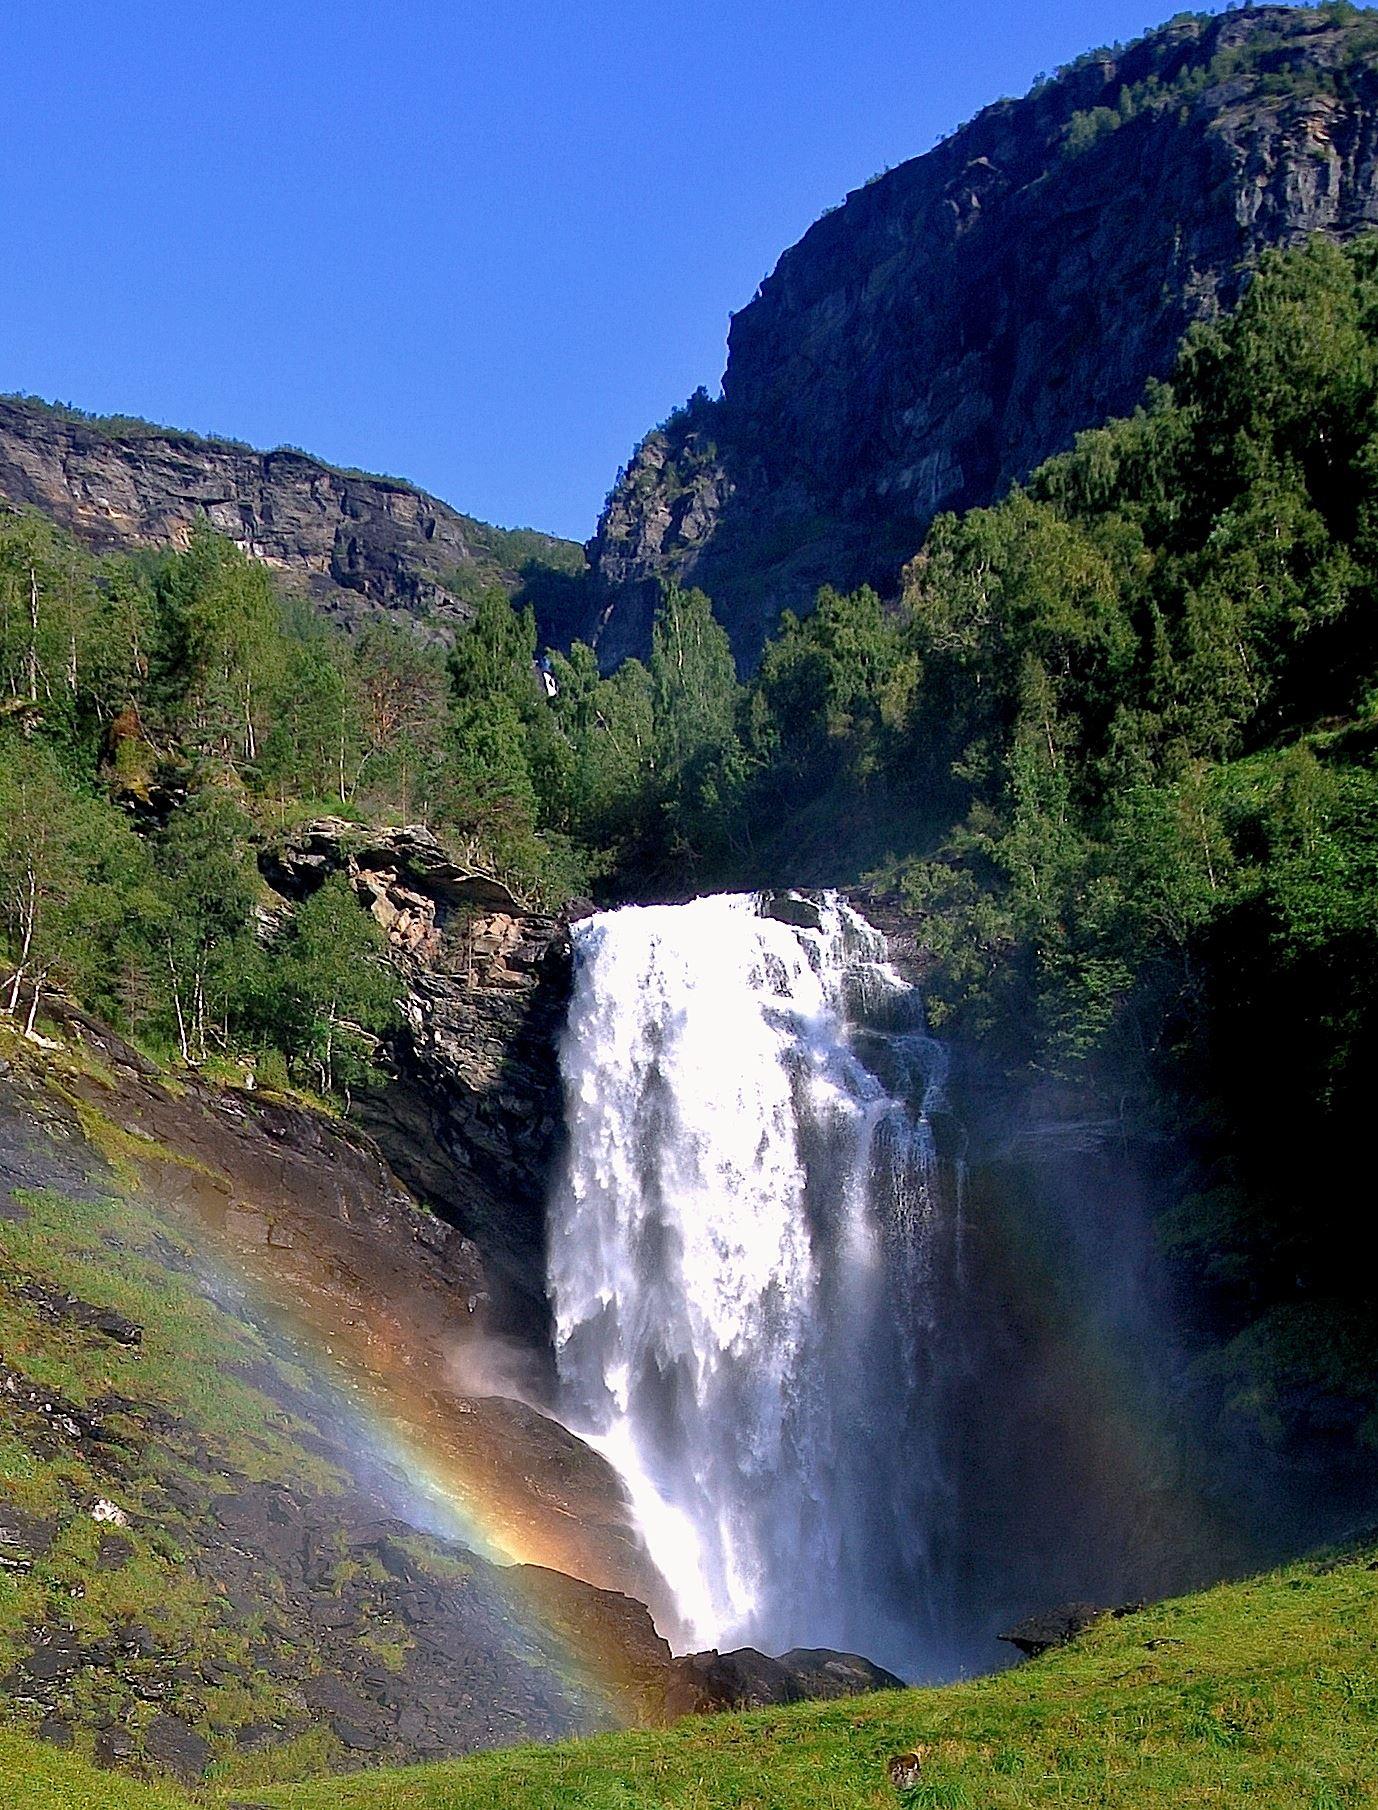 Bike & Hike to Drivande waterfall